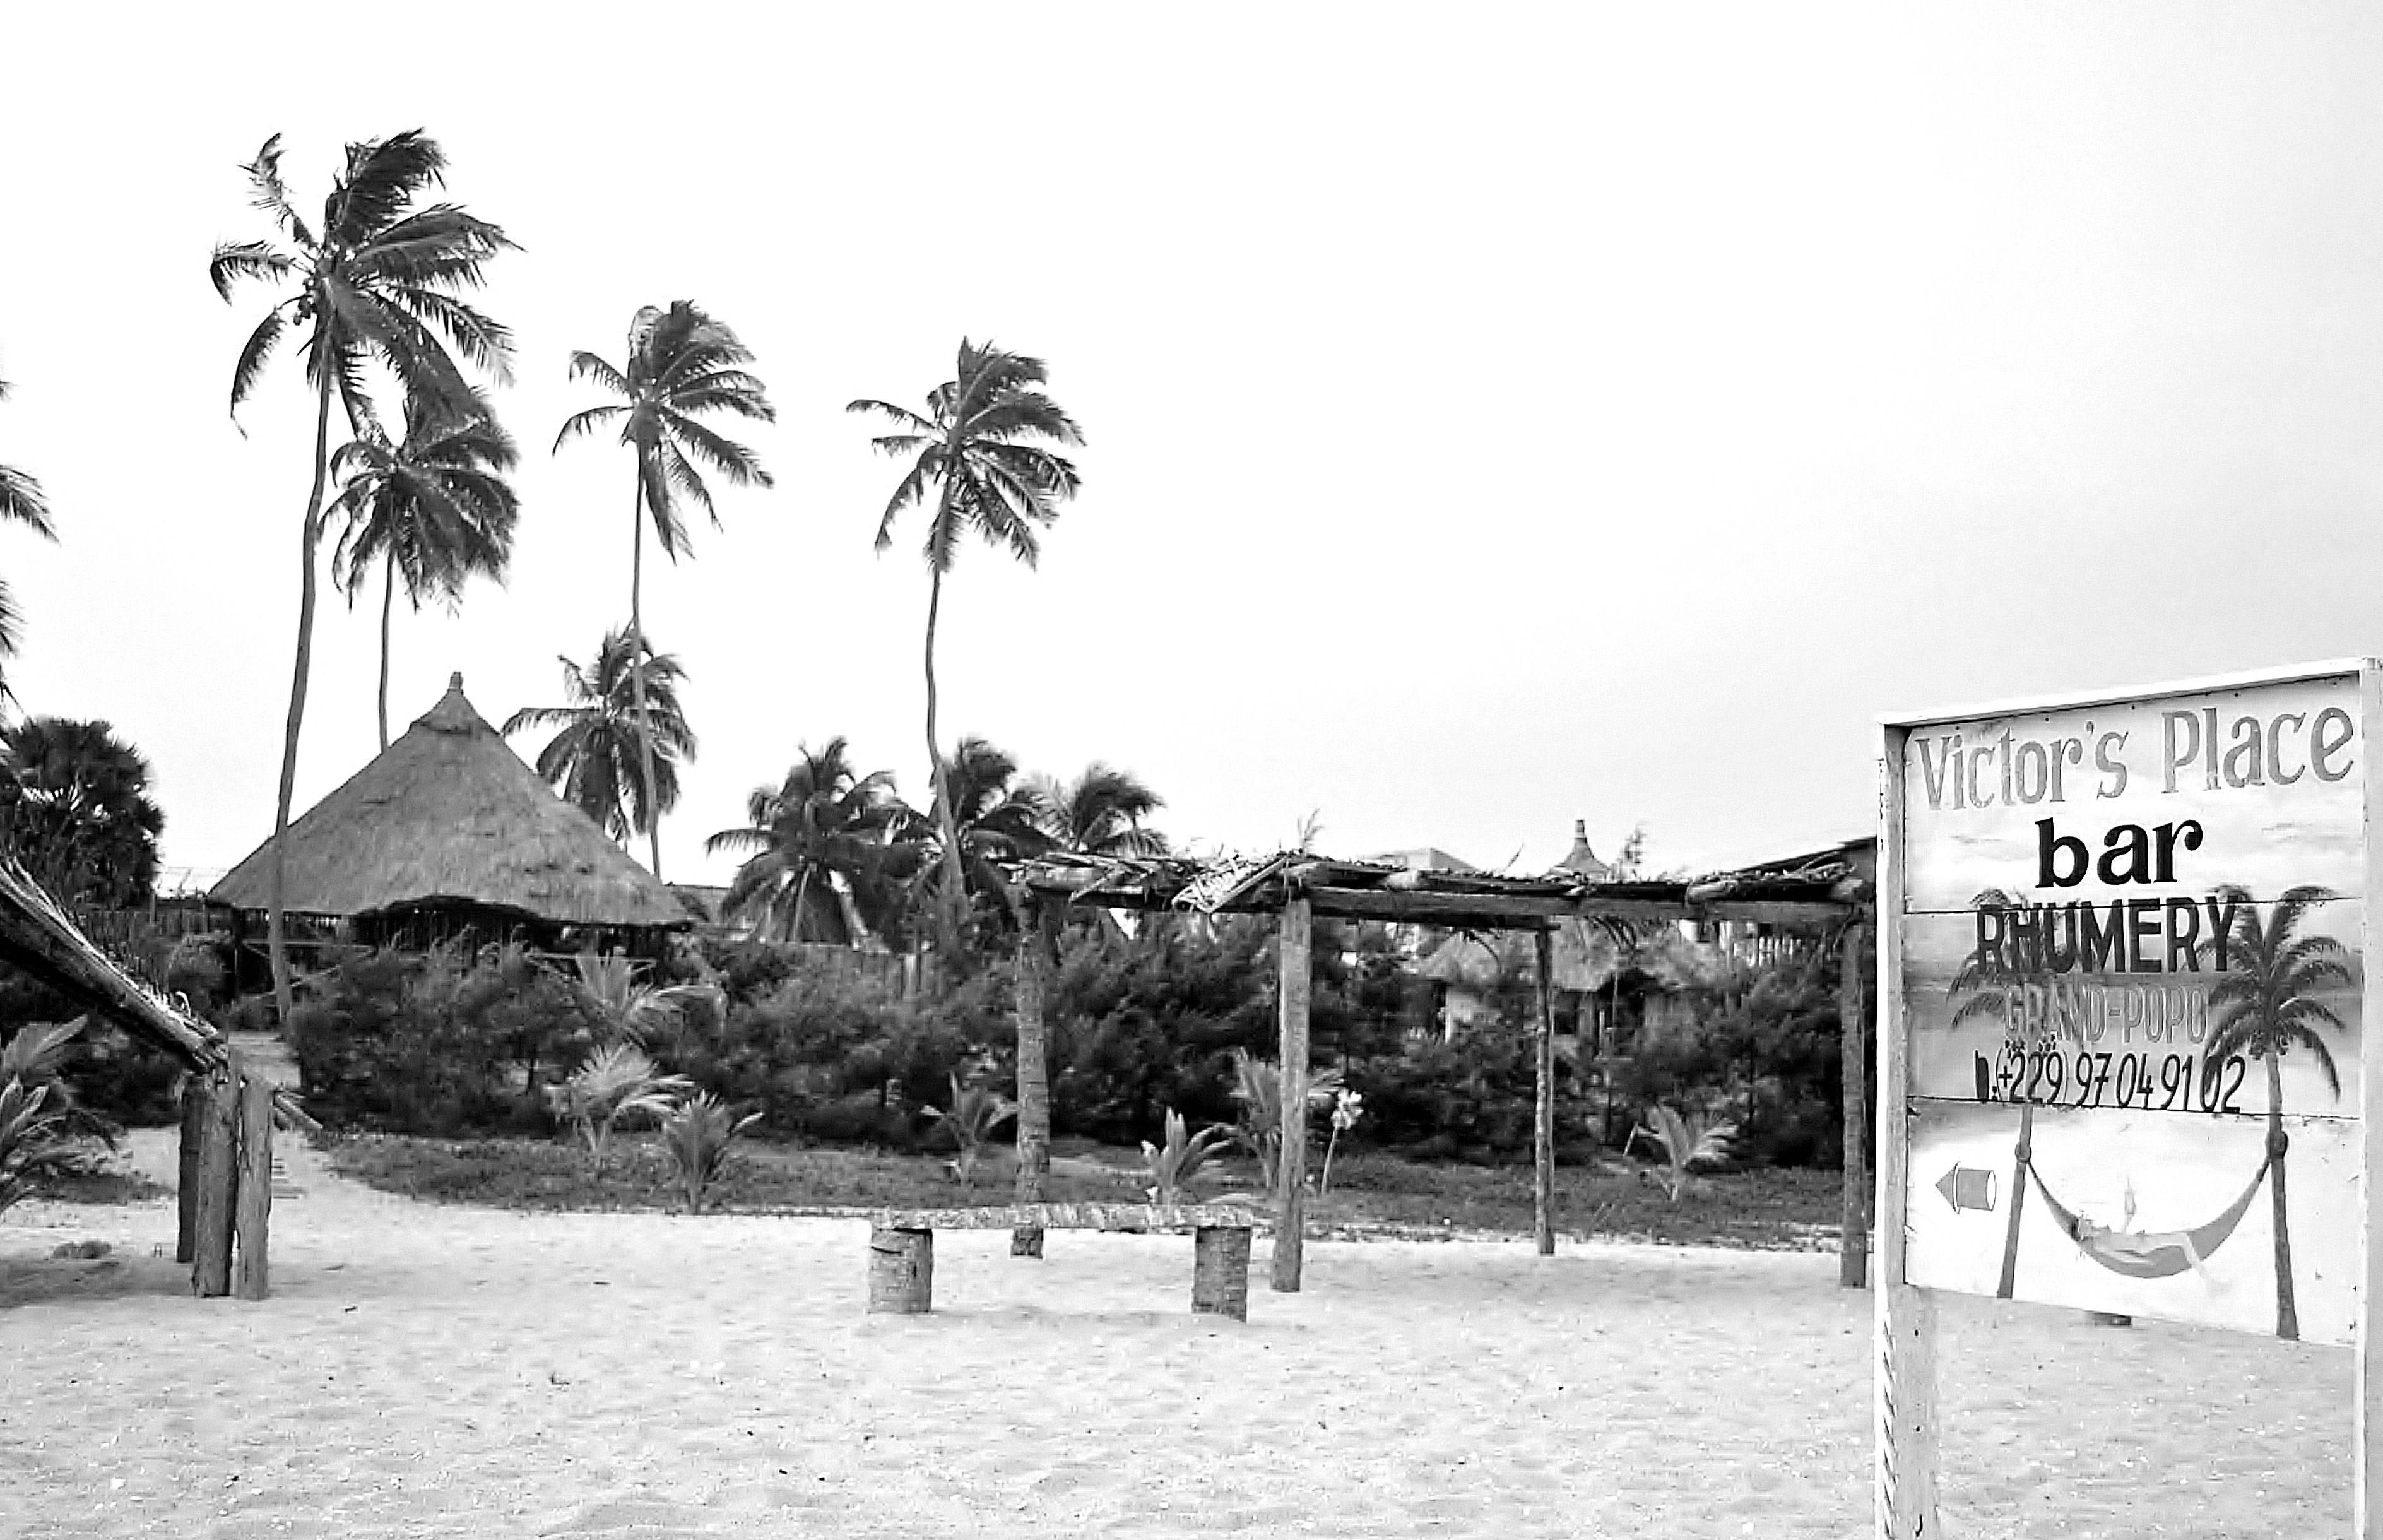 Photo 1: le Victor's place